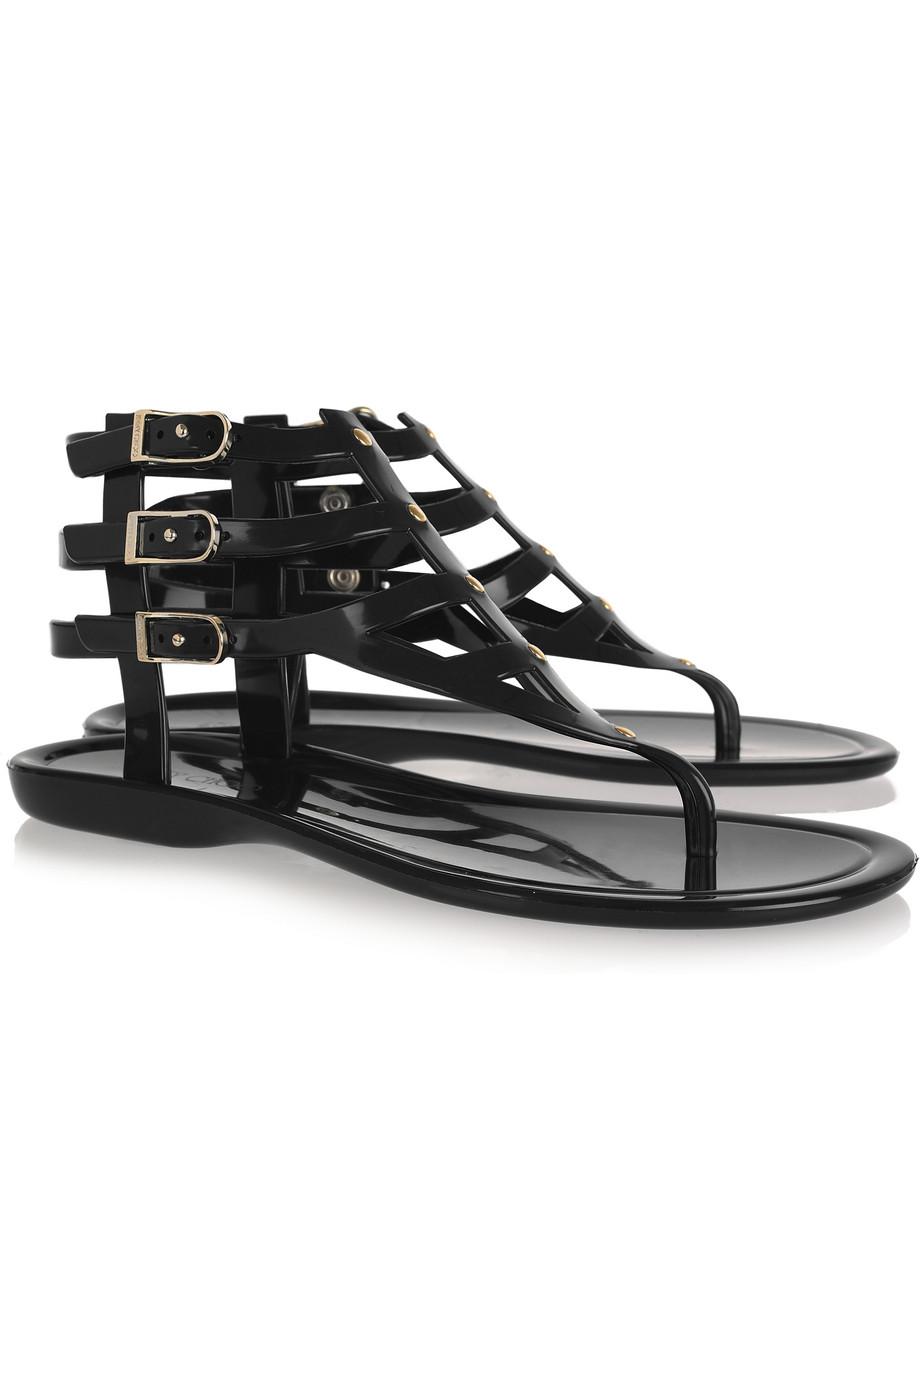 Sandals in black - Gallery